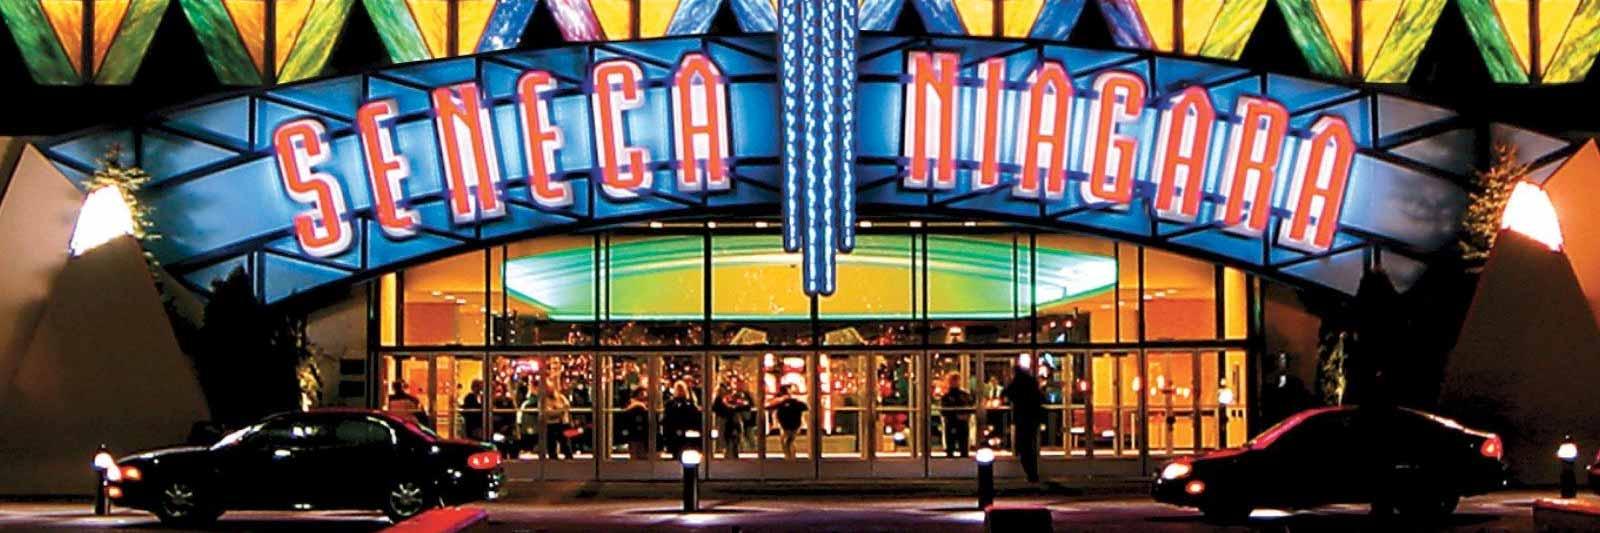 Niagra falls casino package simulated slot machines